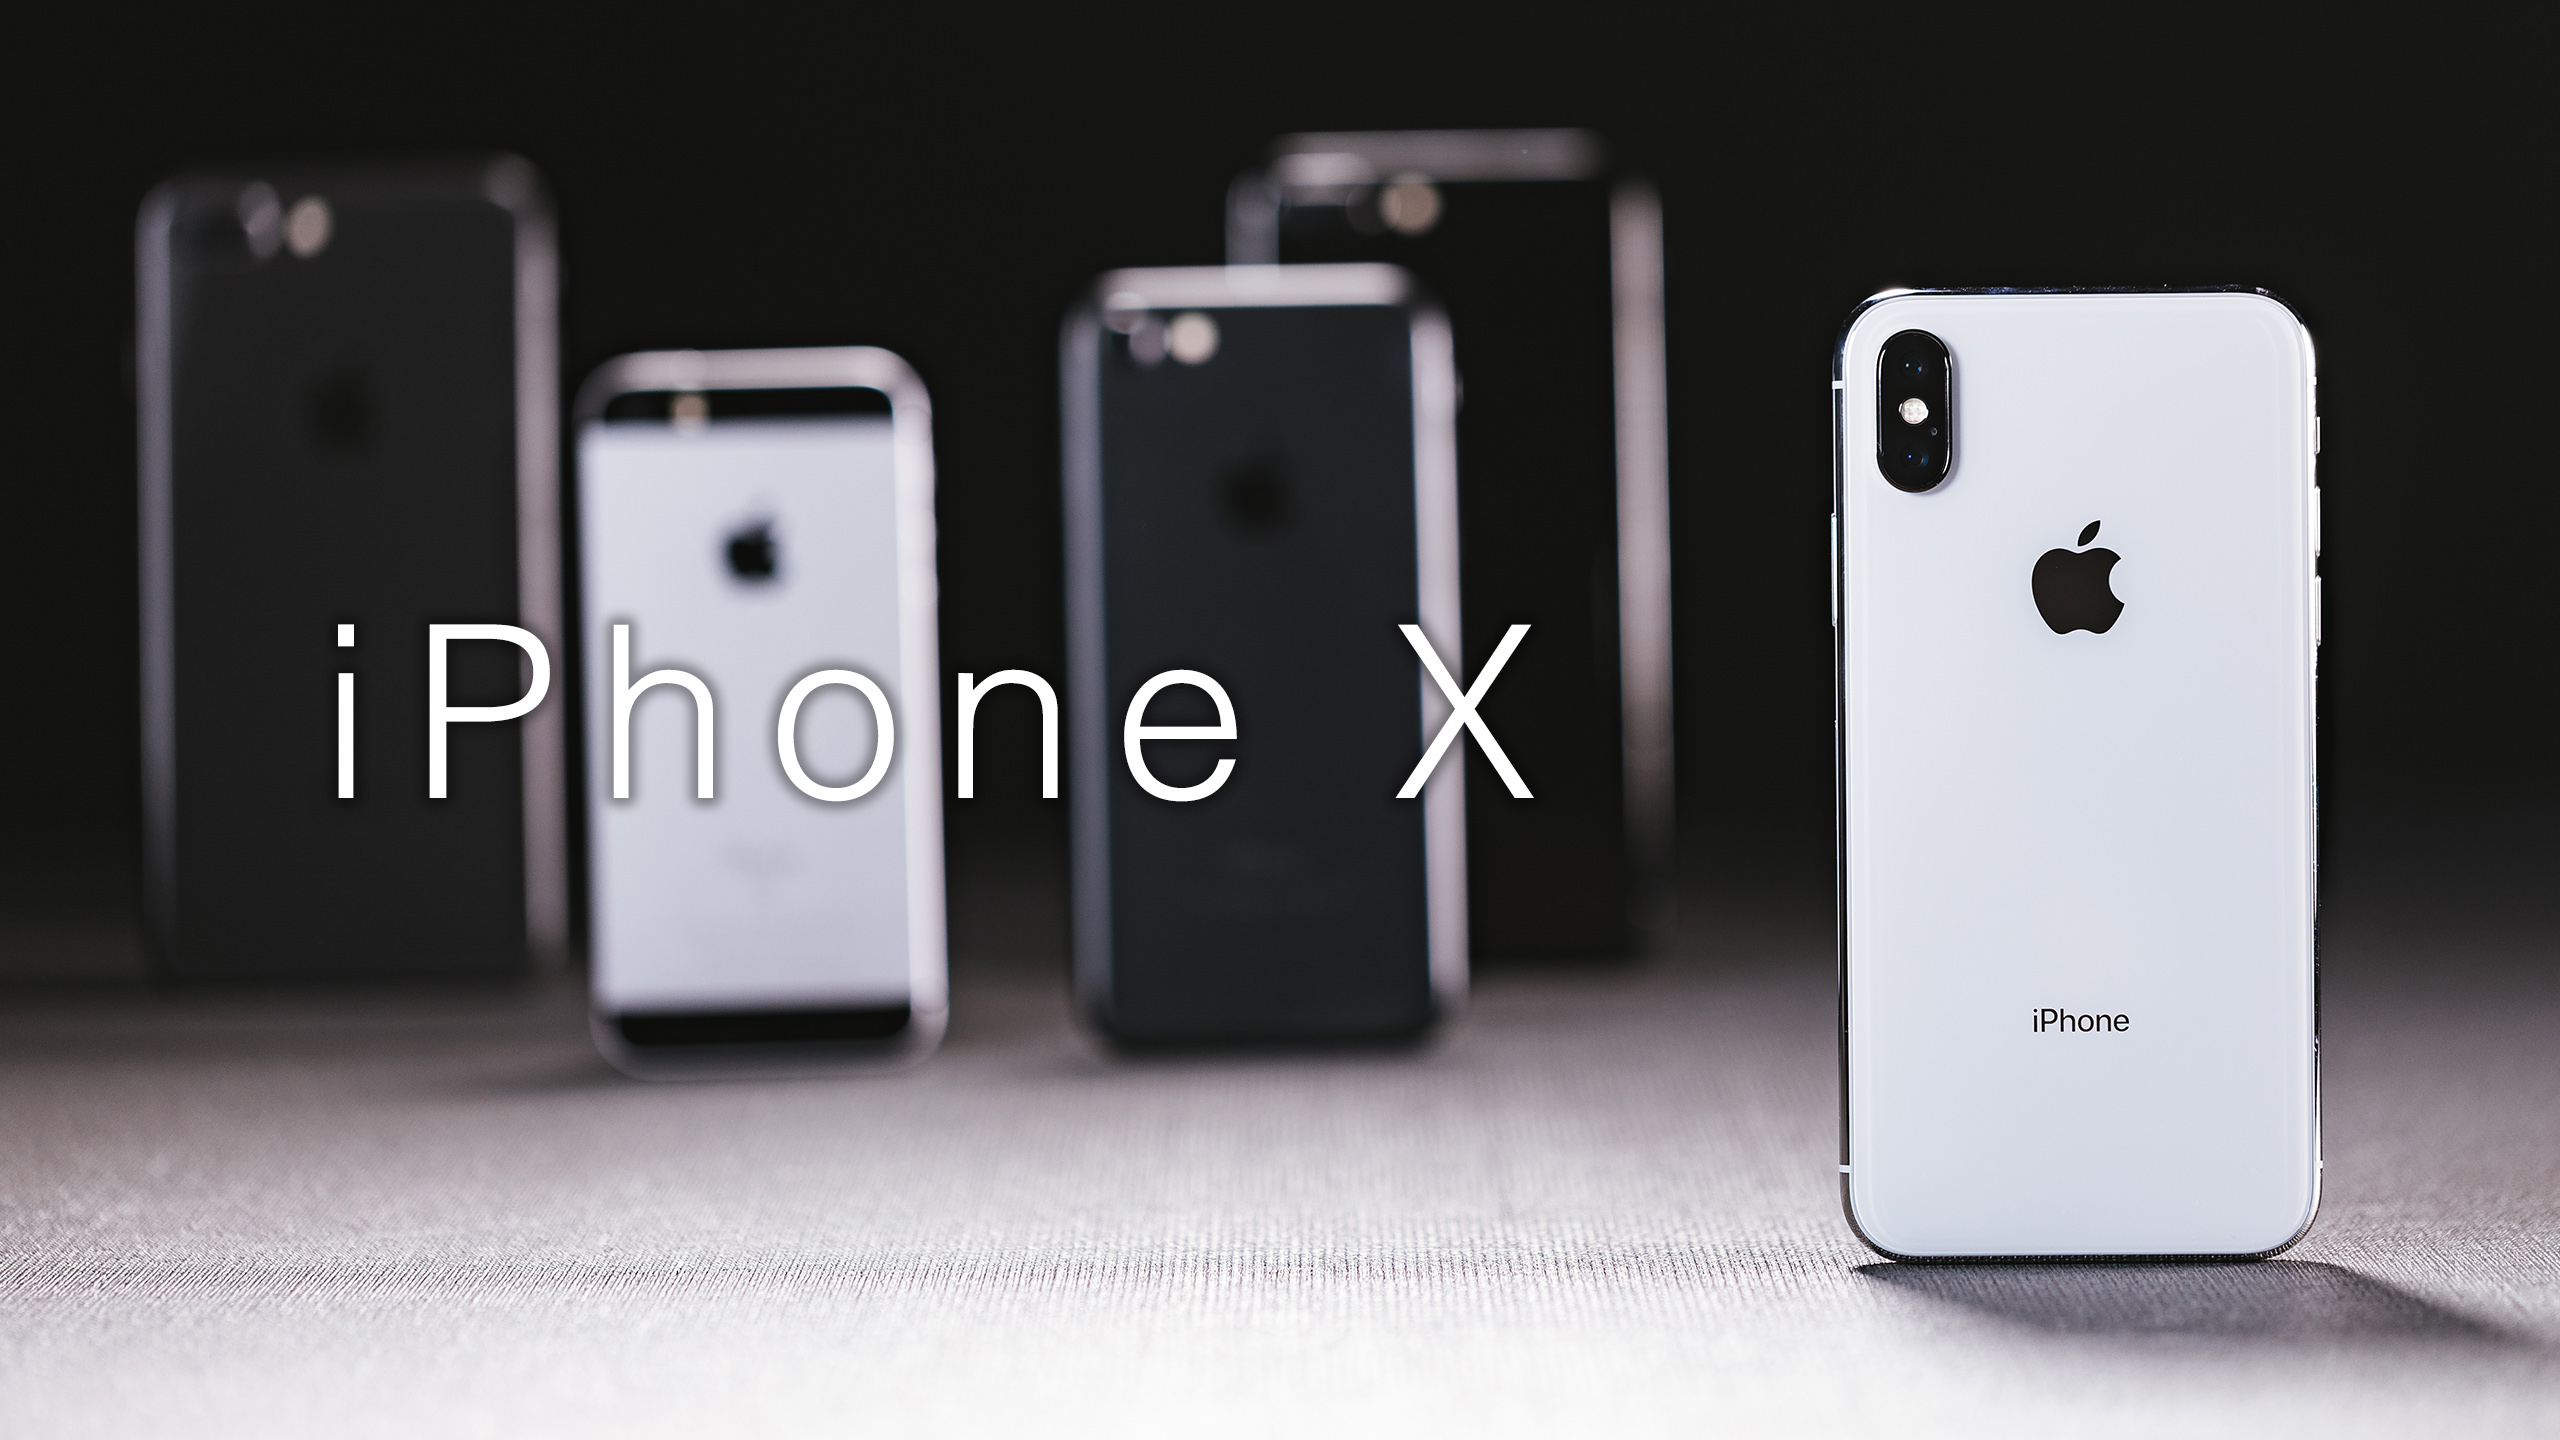 iPhone X 発売! Apple直営店に並ぶ行列の様子やレビュー用商品写真を公開